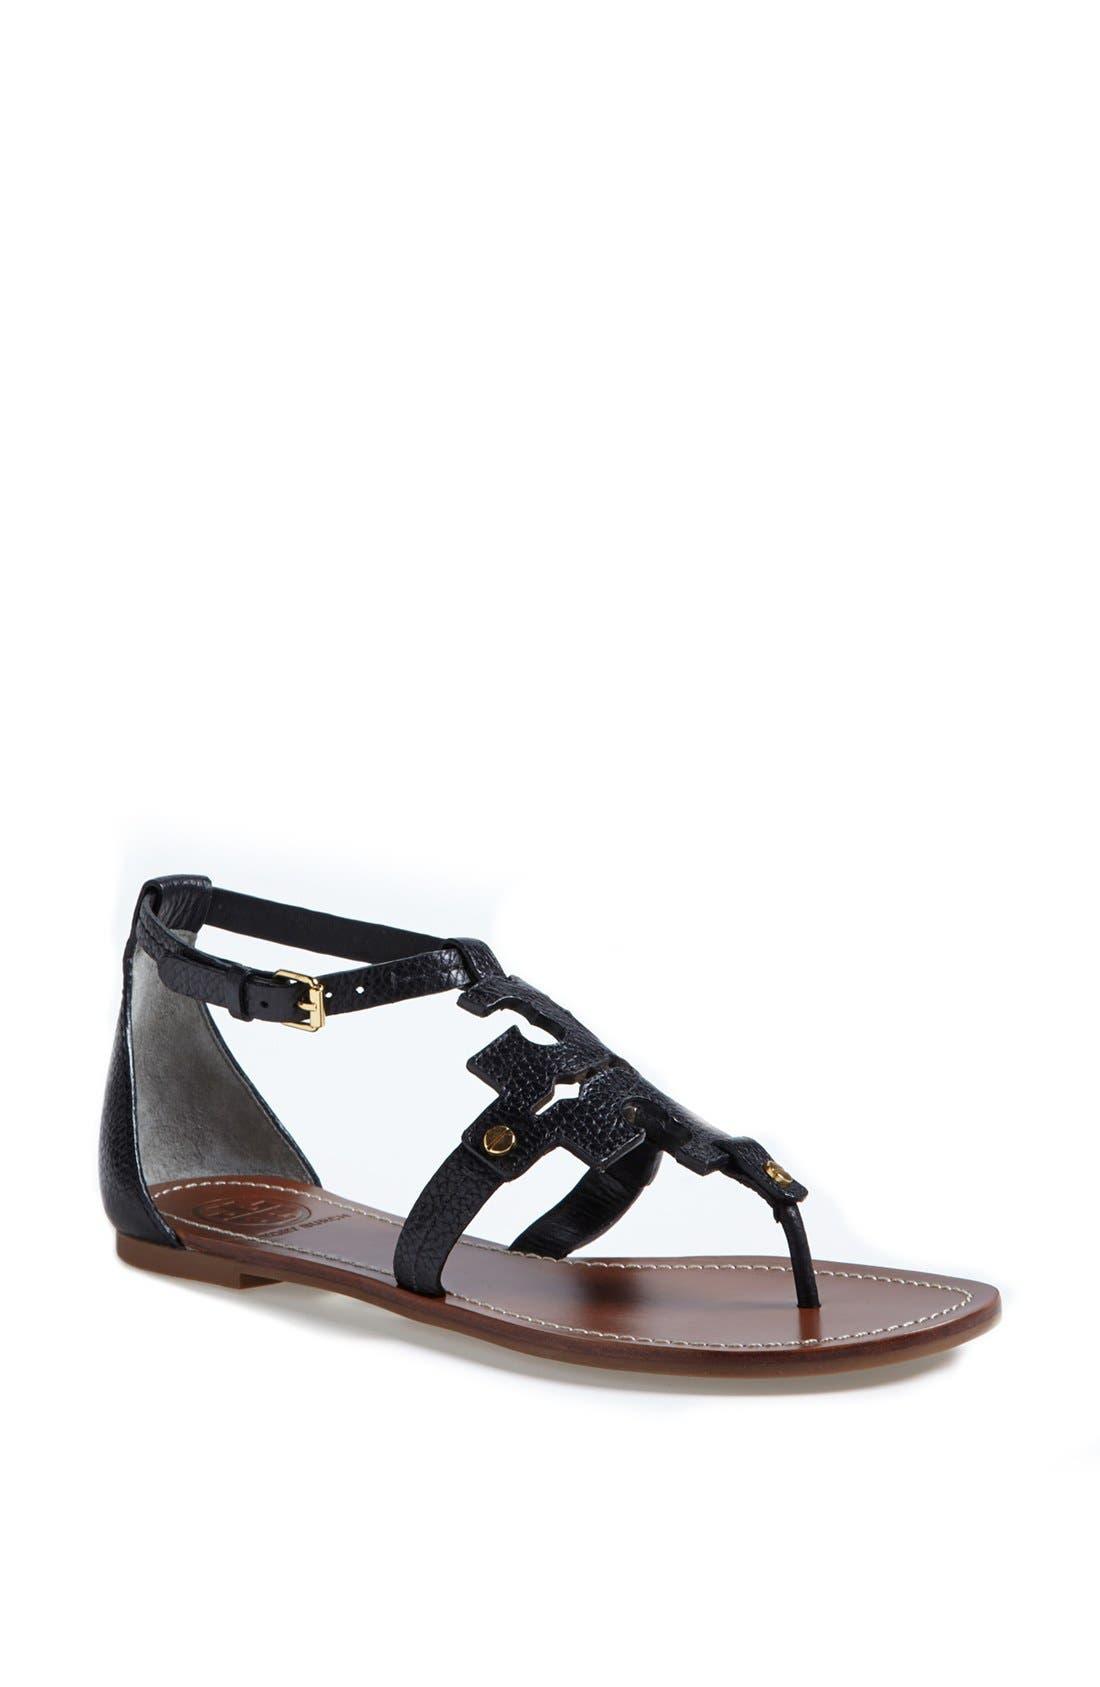 TORY BURCH 'Phoebe' Thong Sandal, Main, color, 001